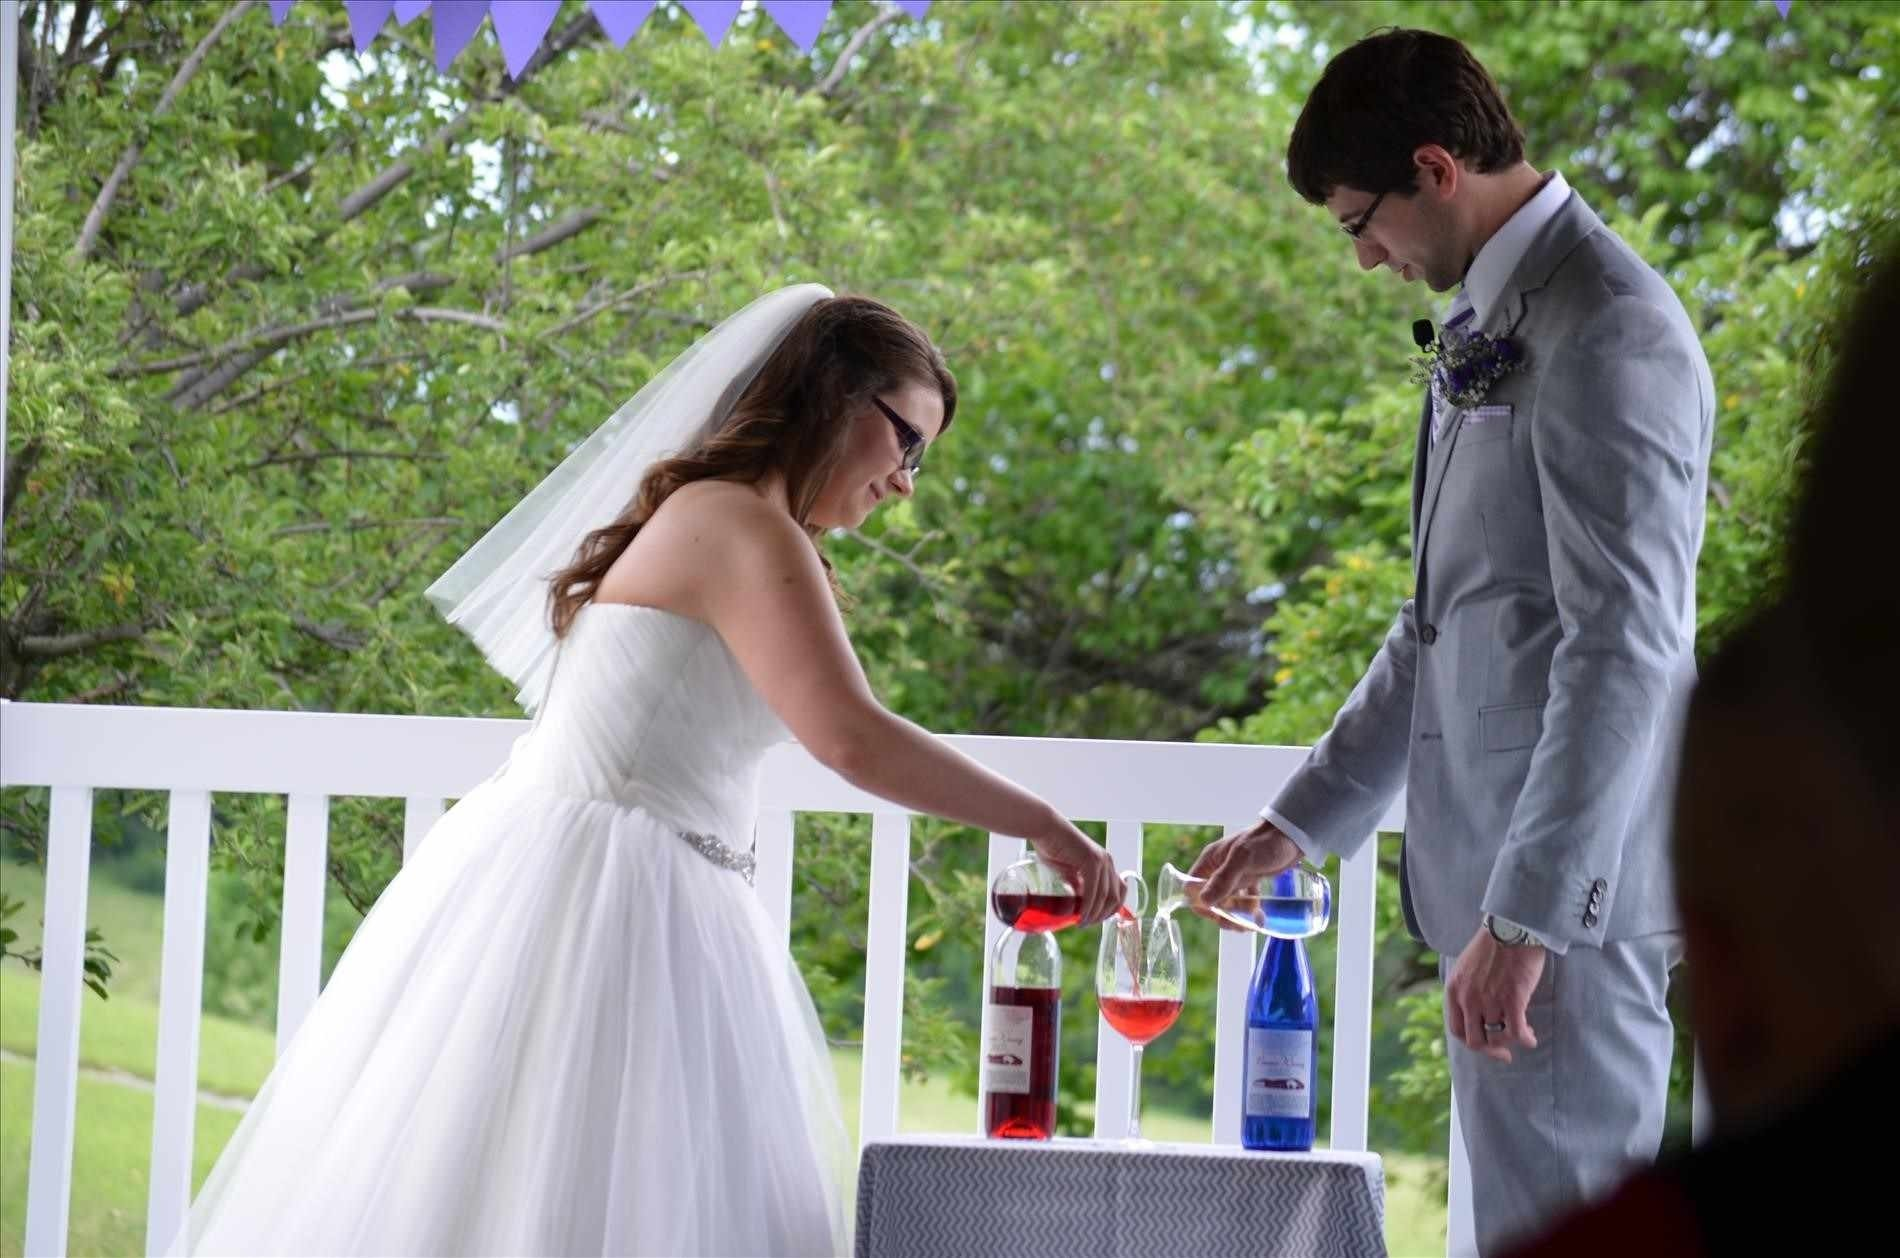 10 Stylish Wedding Ceremony Ideas Instead Of Unity Candle wedding ceremony ideas instead of unity candle ceremony ideas 1 2021